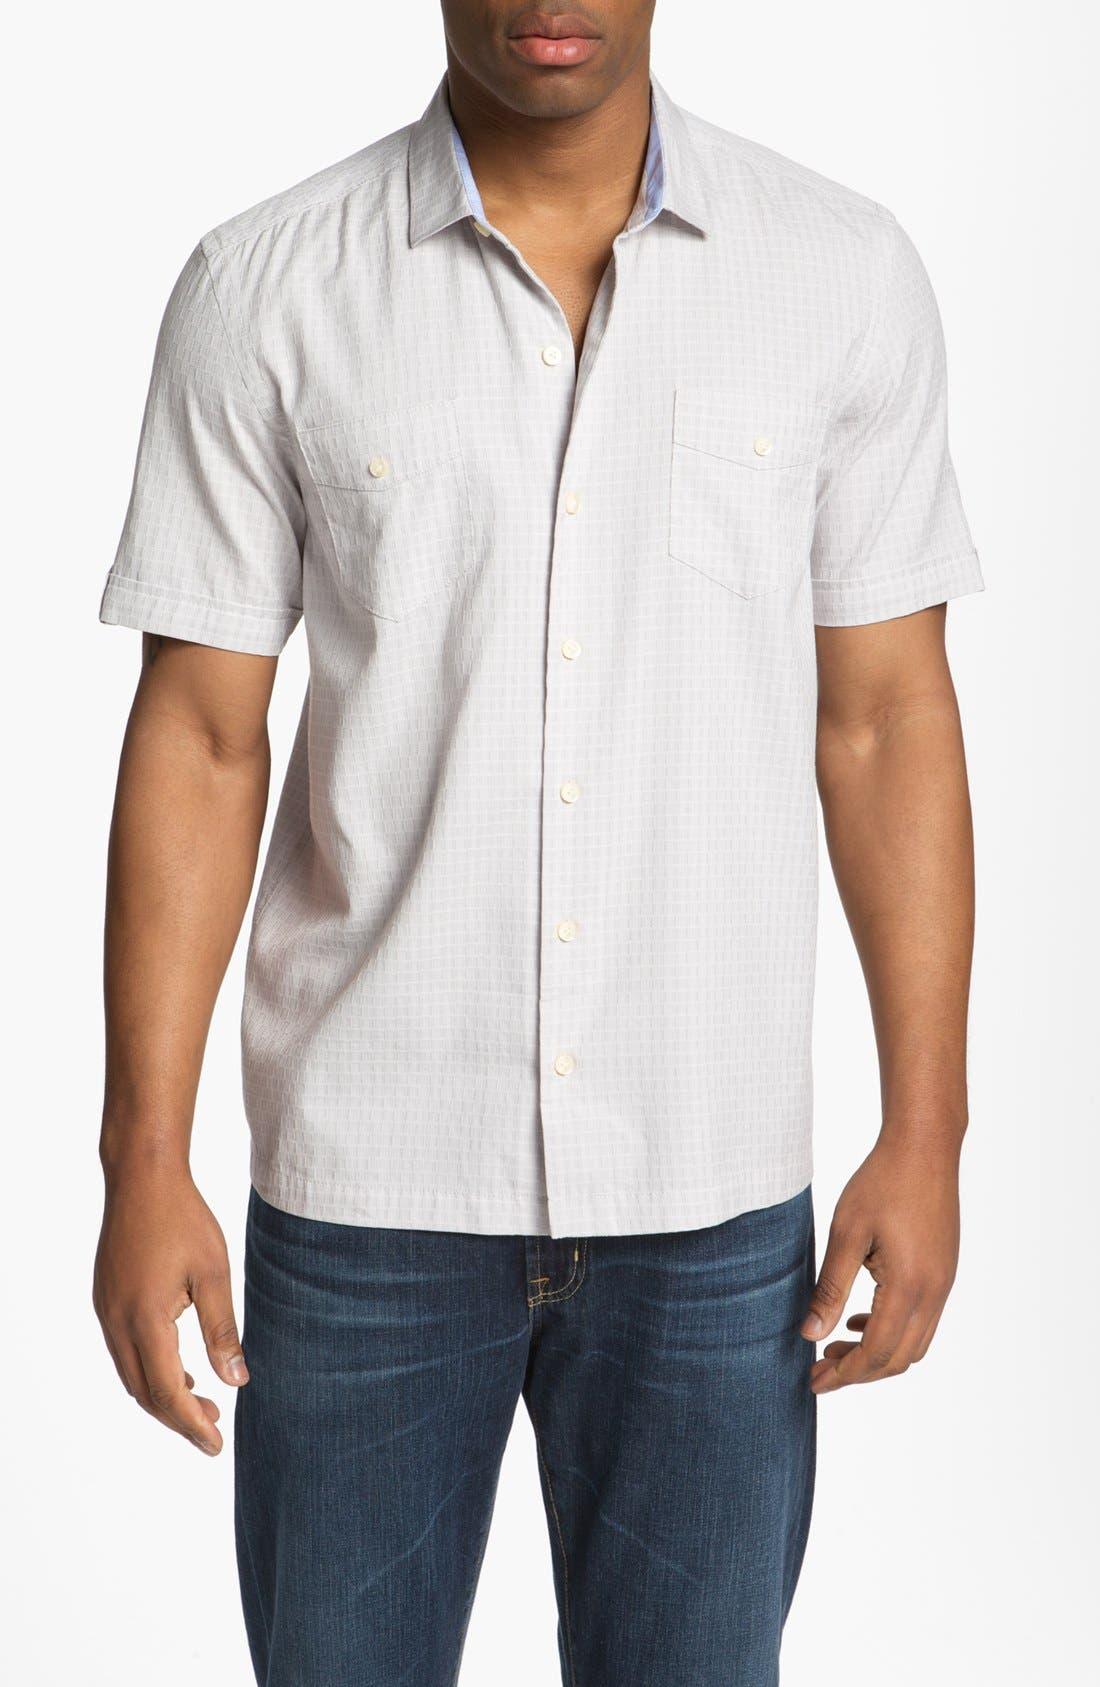 Alternate Image 1 Selected - Tommy Bahama 'Sound Wave' Silk Blend Campshirt